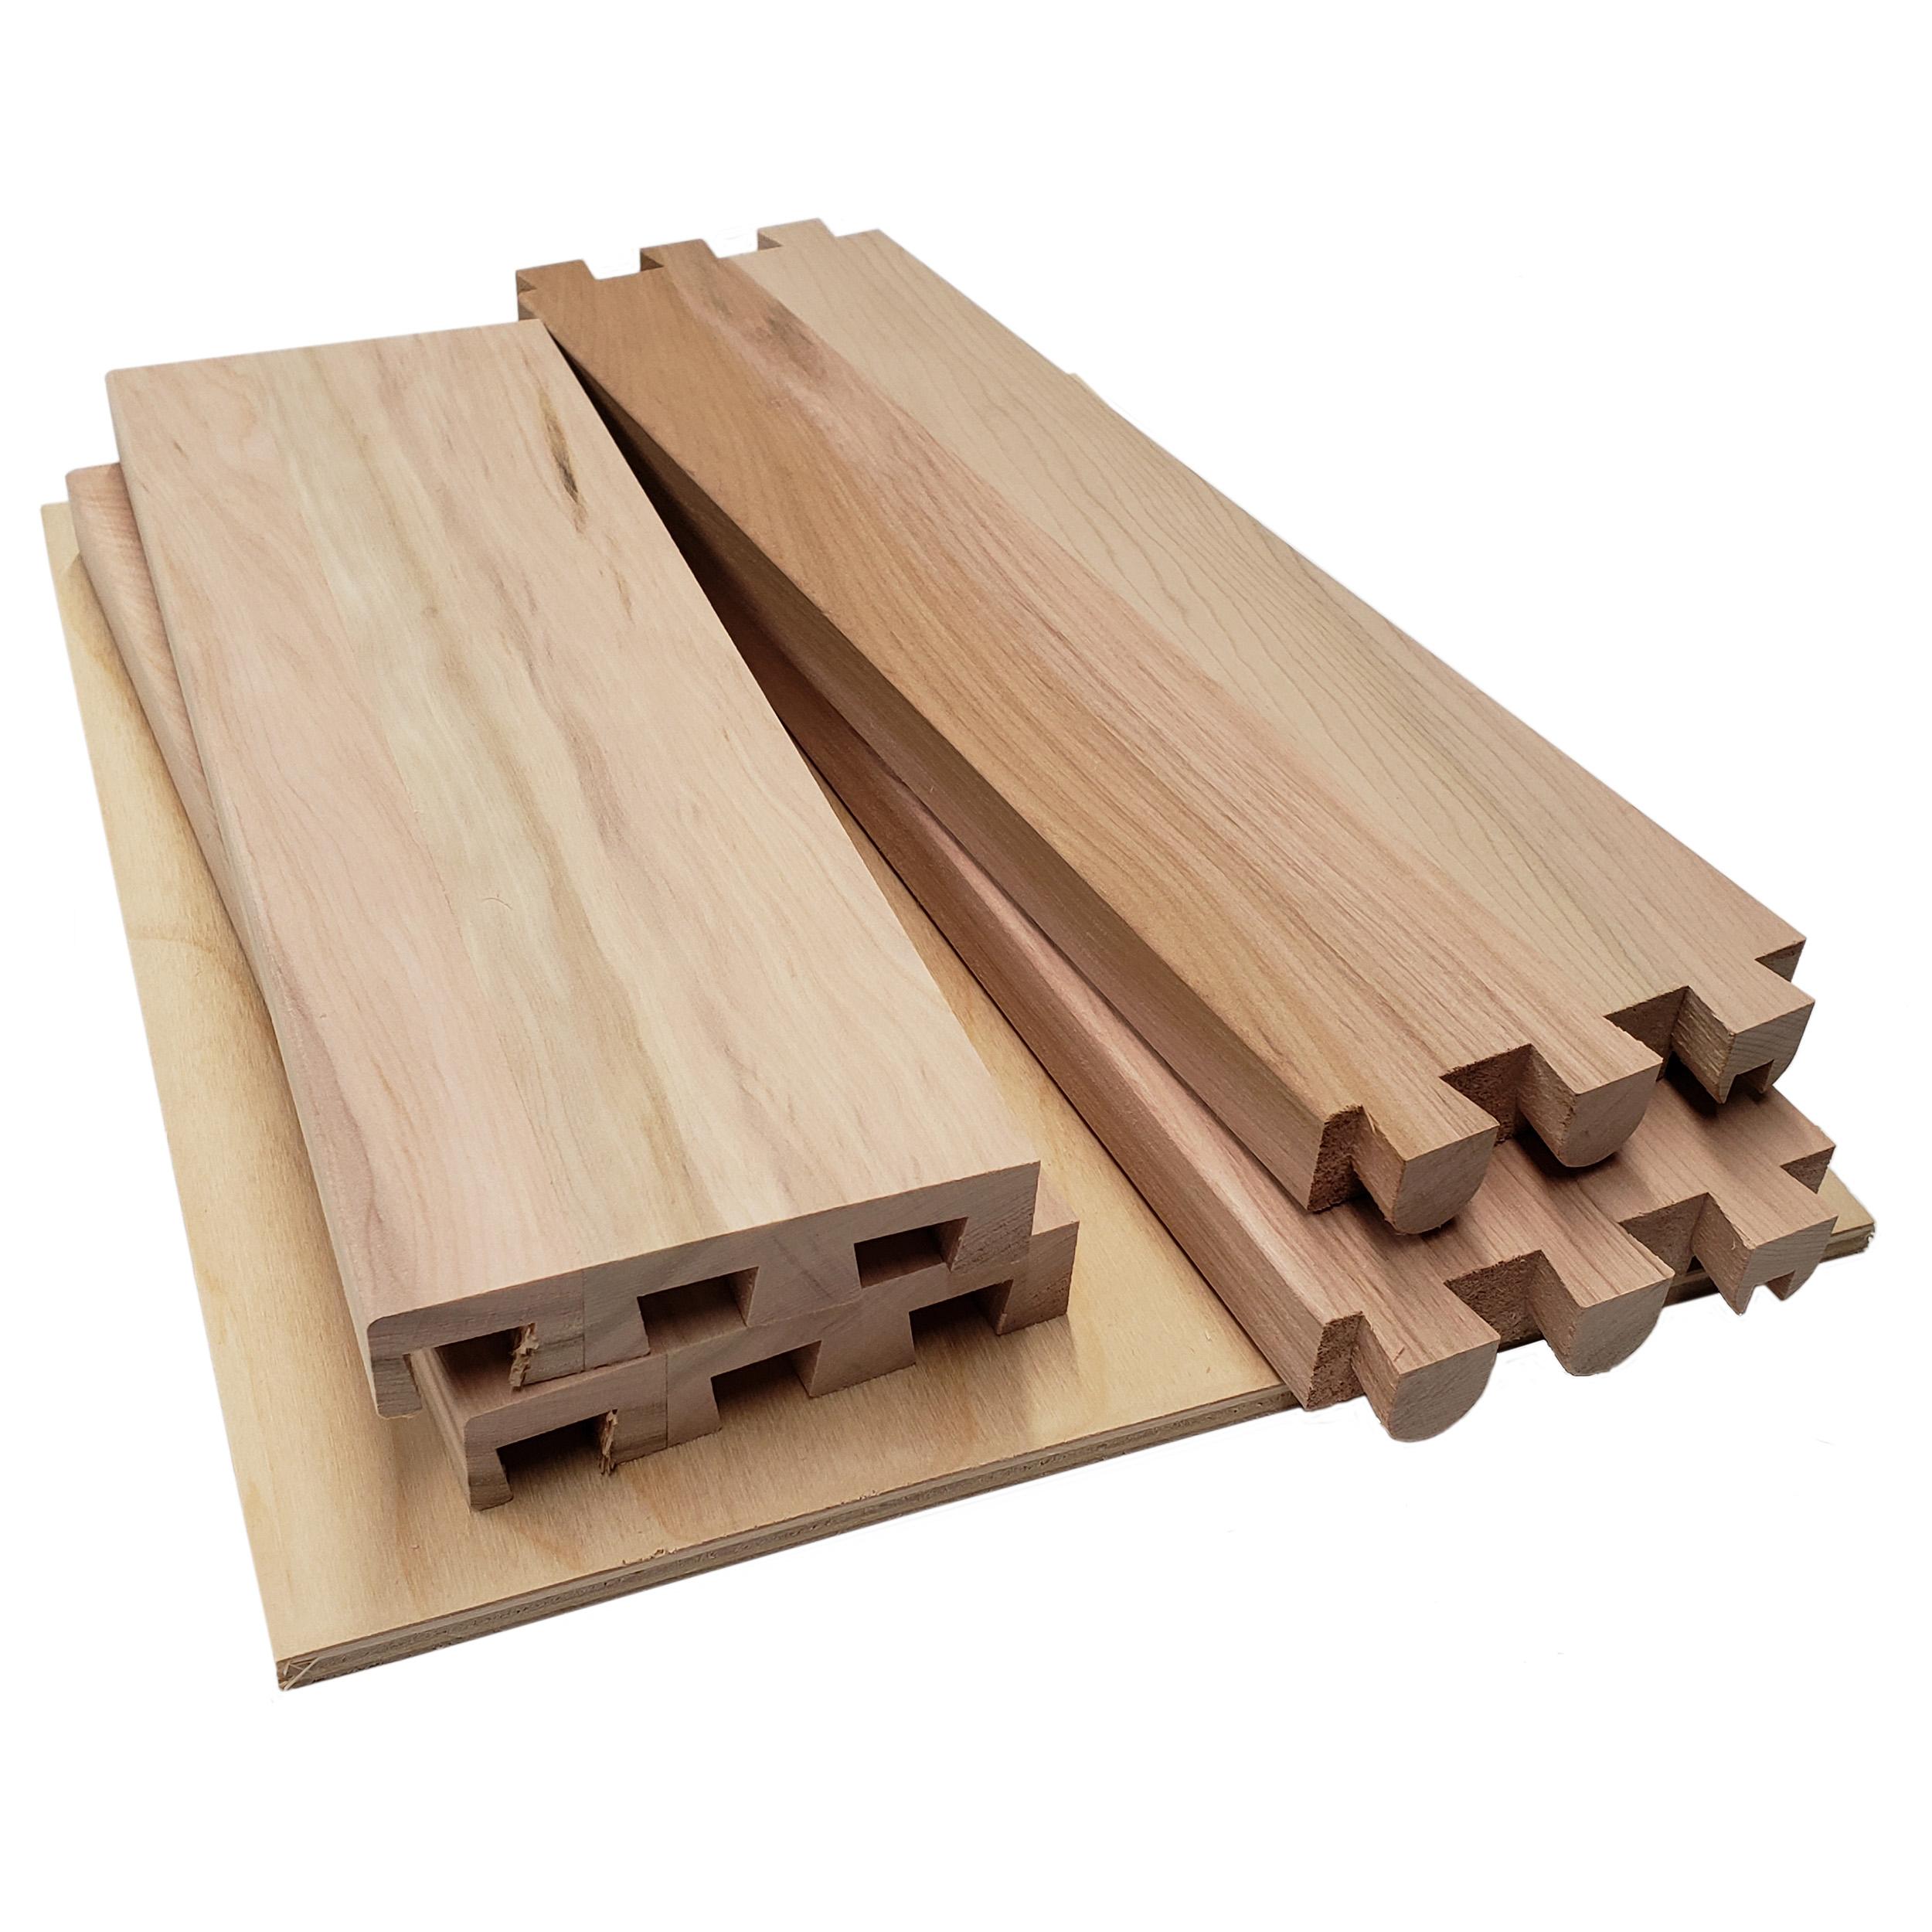 Dovetail Drawer Boxes - 10.125